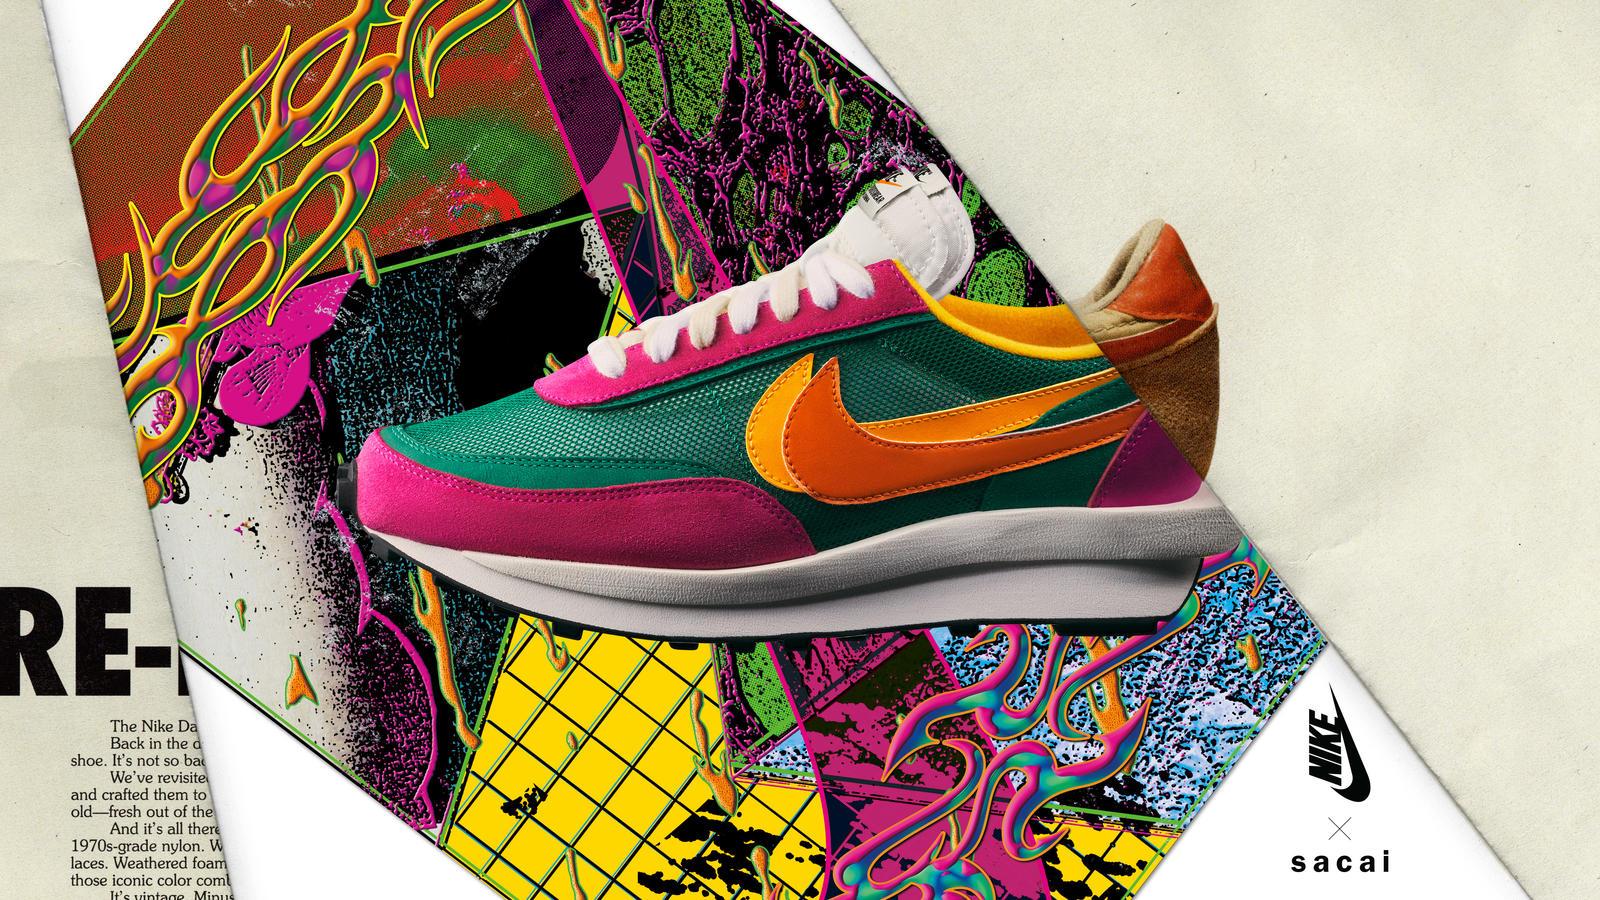 Sacai x Nike LDWaffle Pine GreenDel Sol